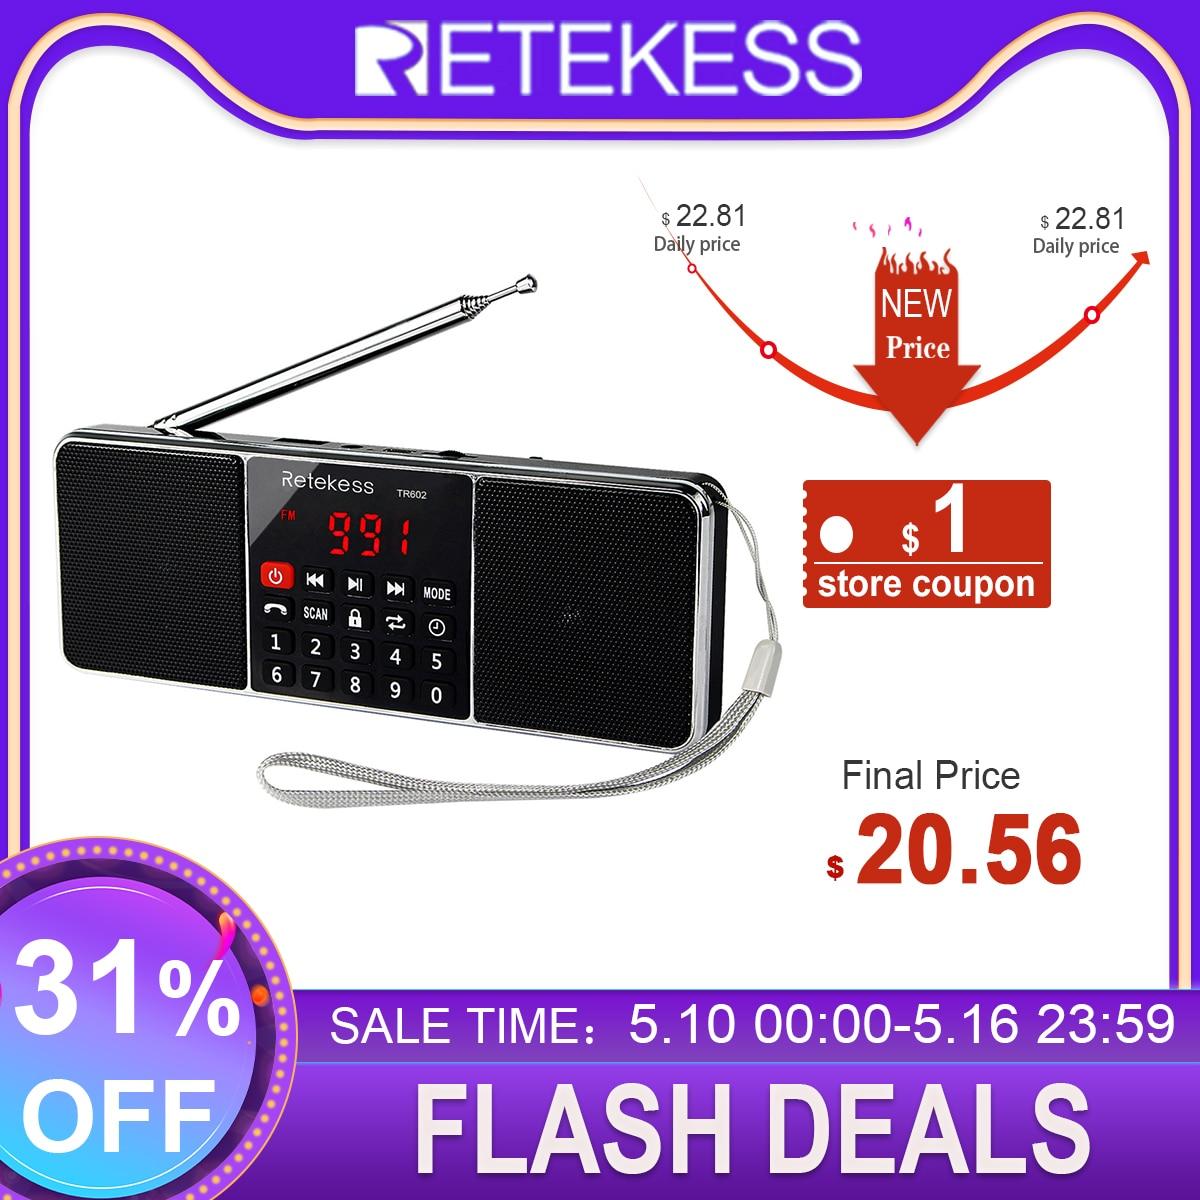 RETEKESS TR602 Digital Portable Radio AM FM Bluetooth Speaker Stereo MP3 Player TF/SD Card USB Drive Handsfree Call LED Display